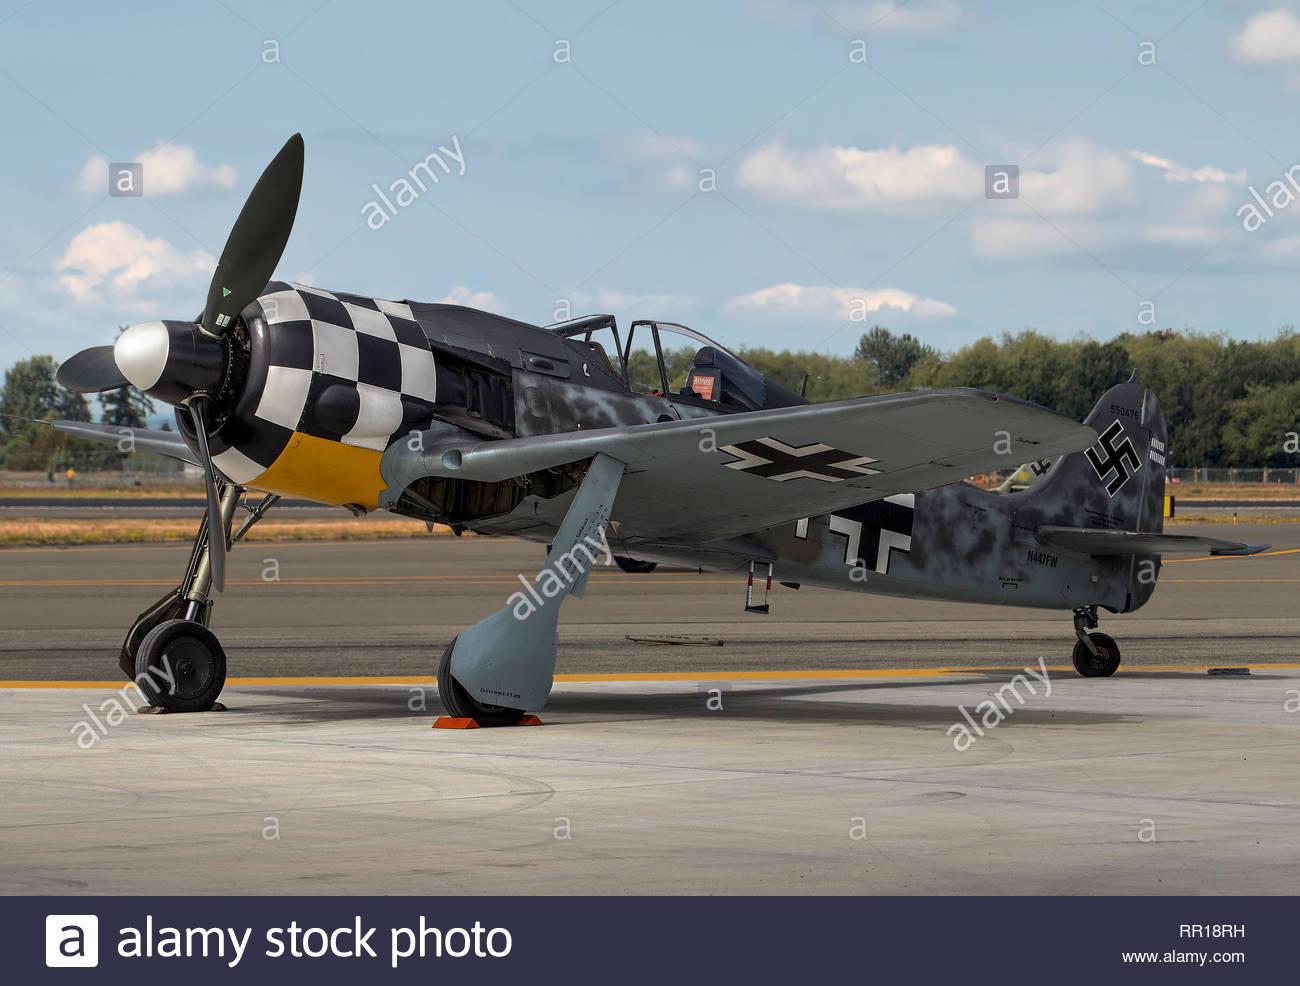 Focke-Wulf FW190 A/9  on apron - Stock Image